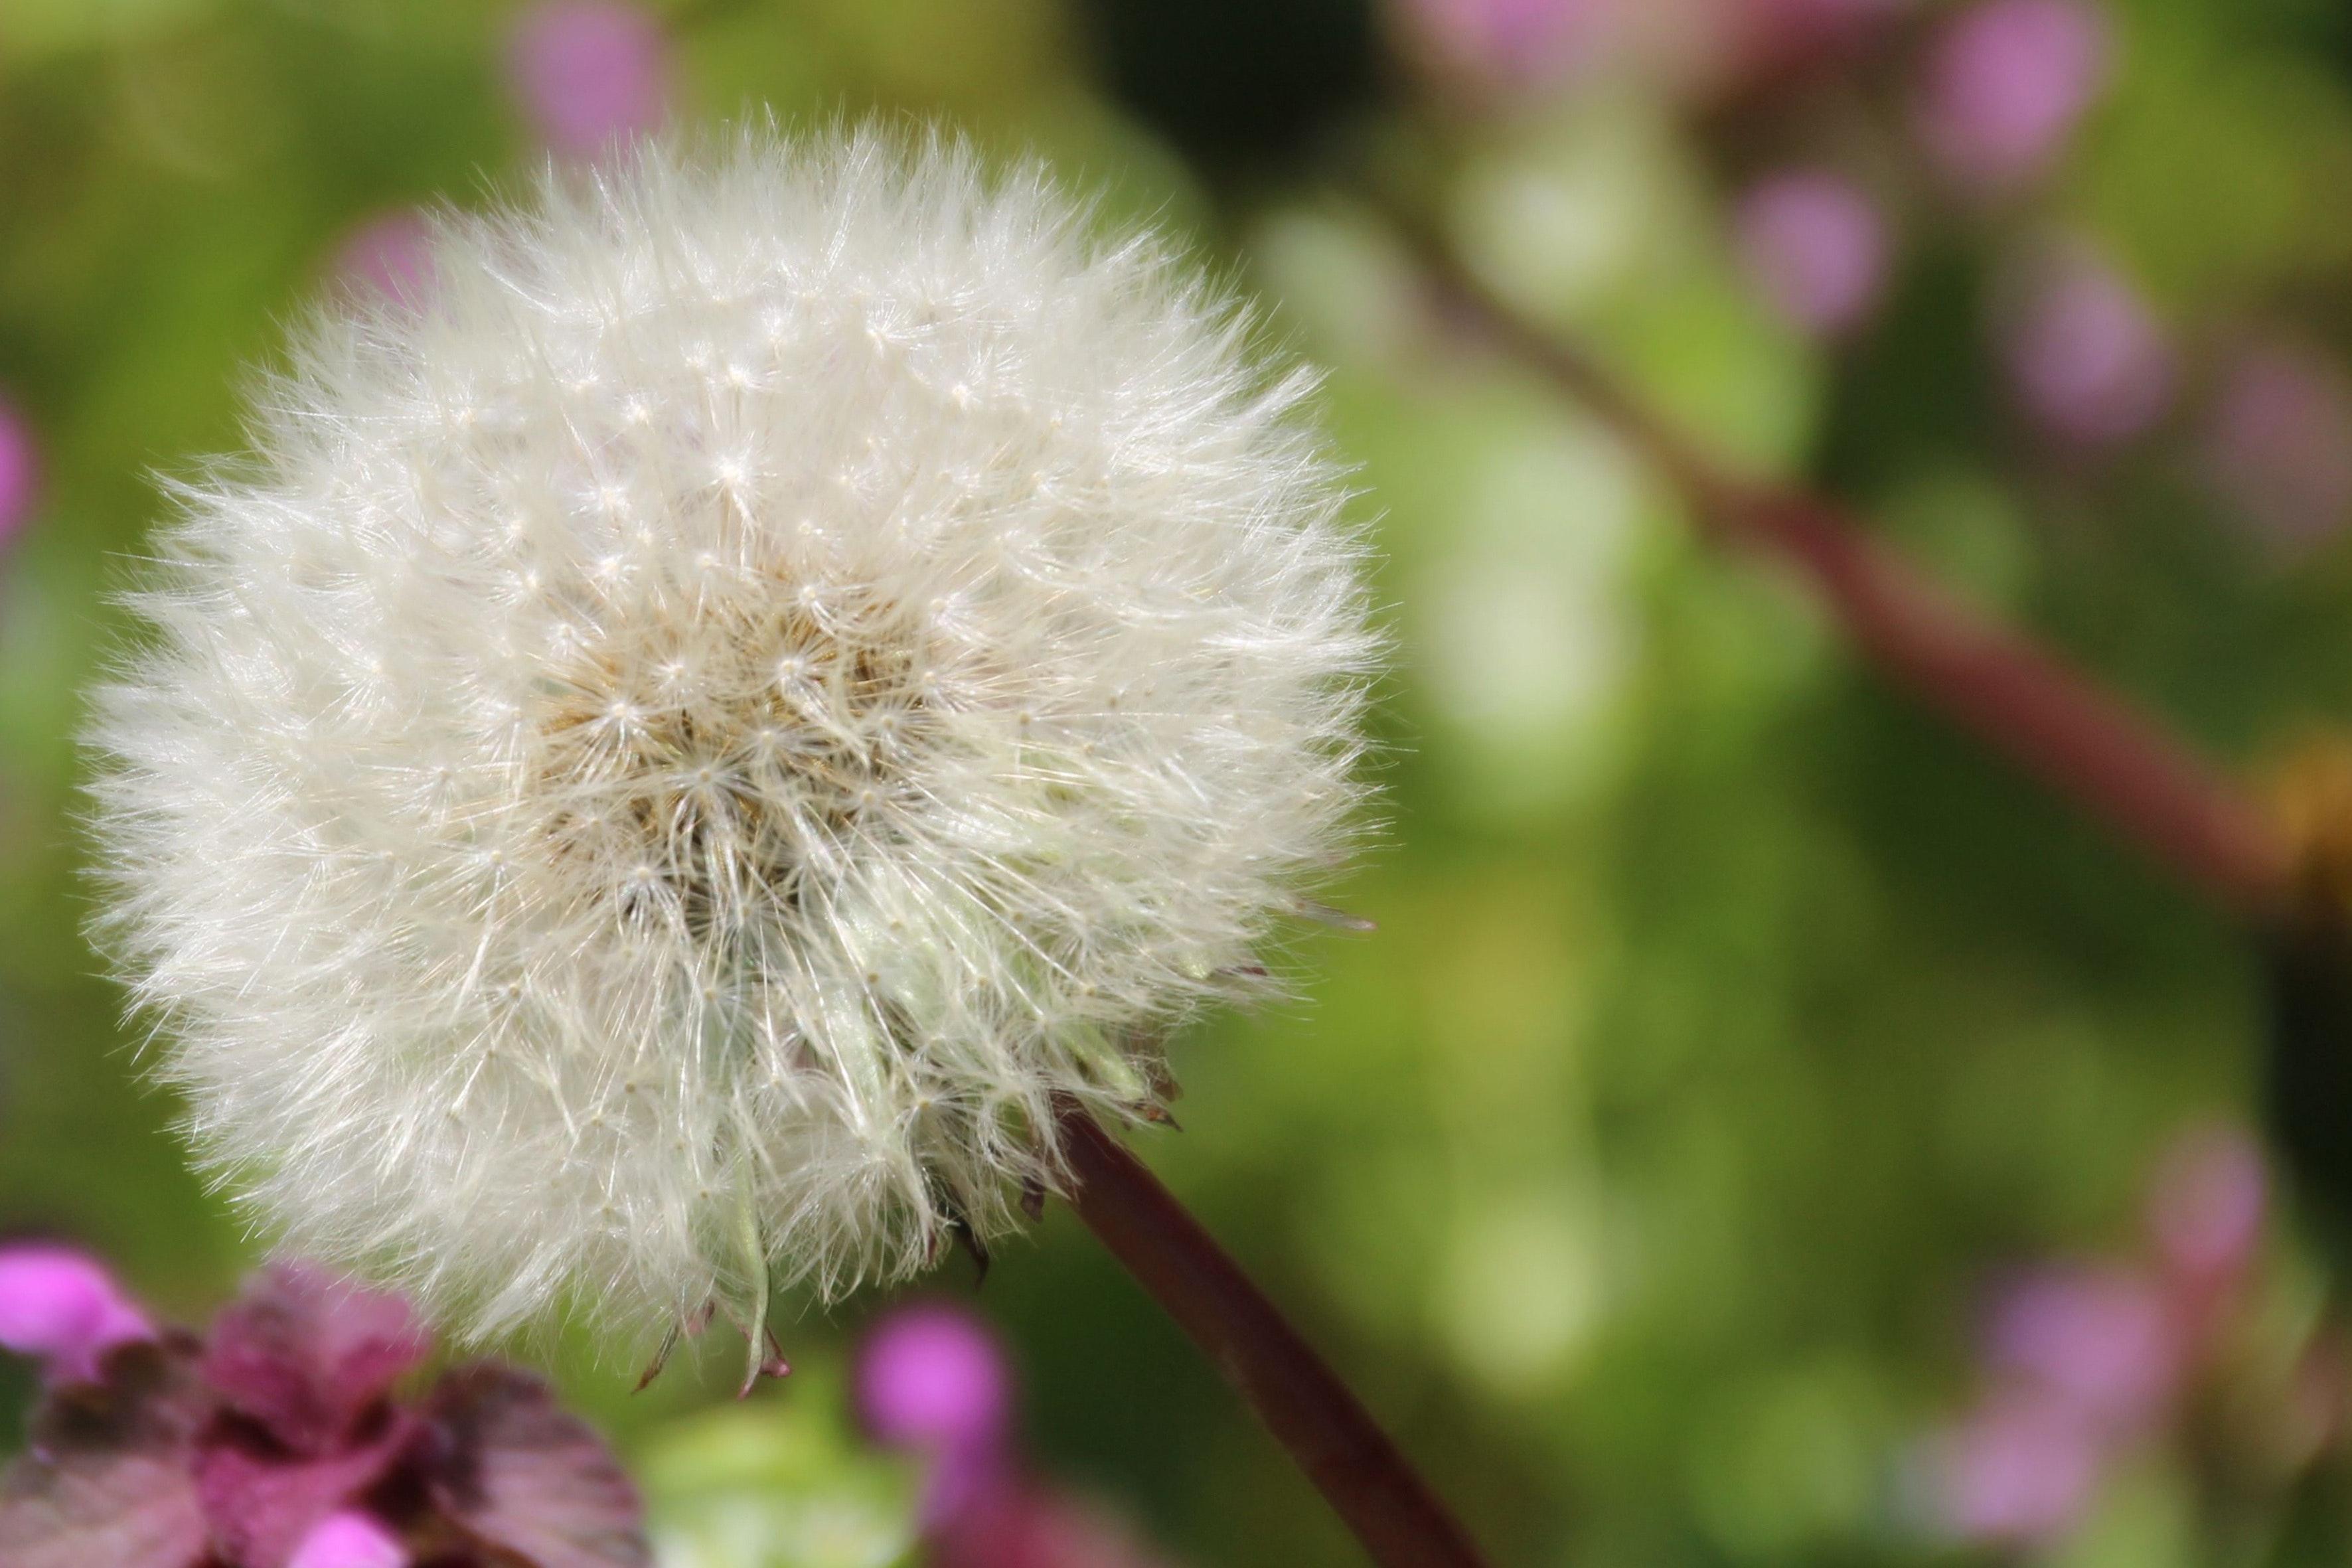 Dandelion in macro shot photography